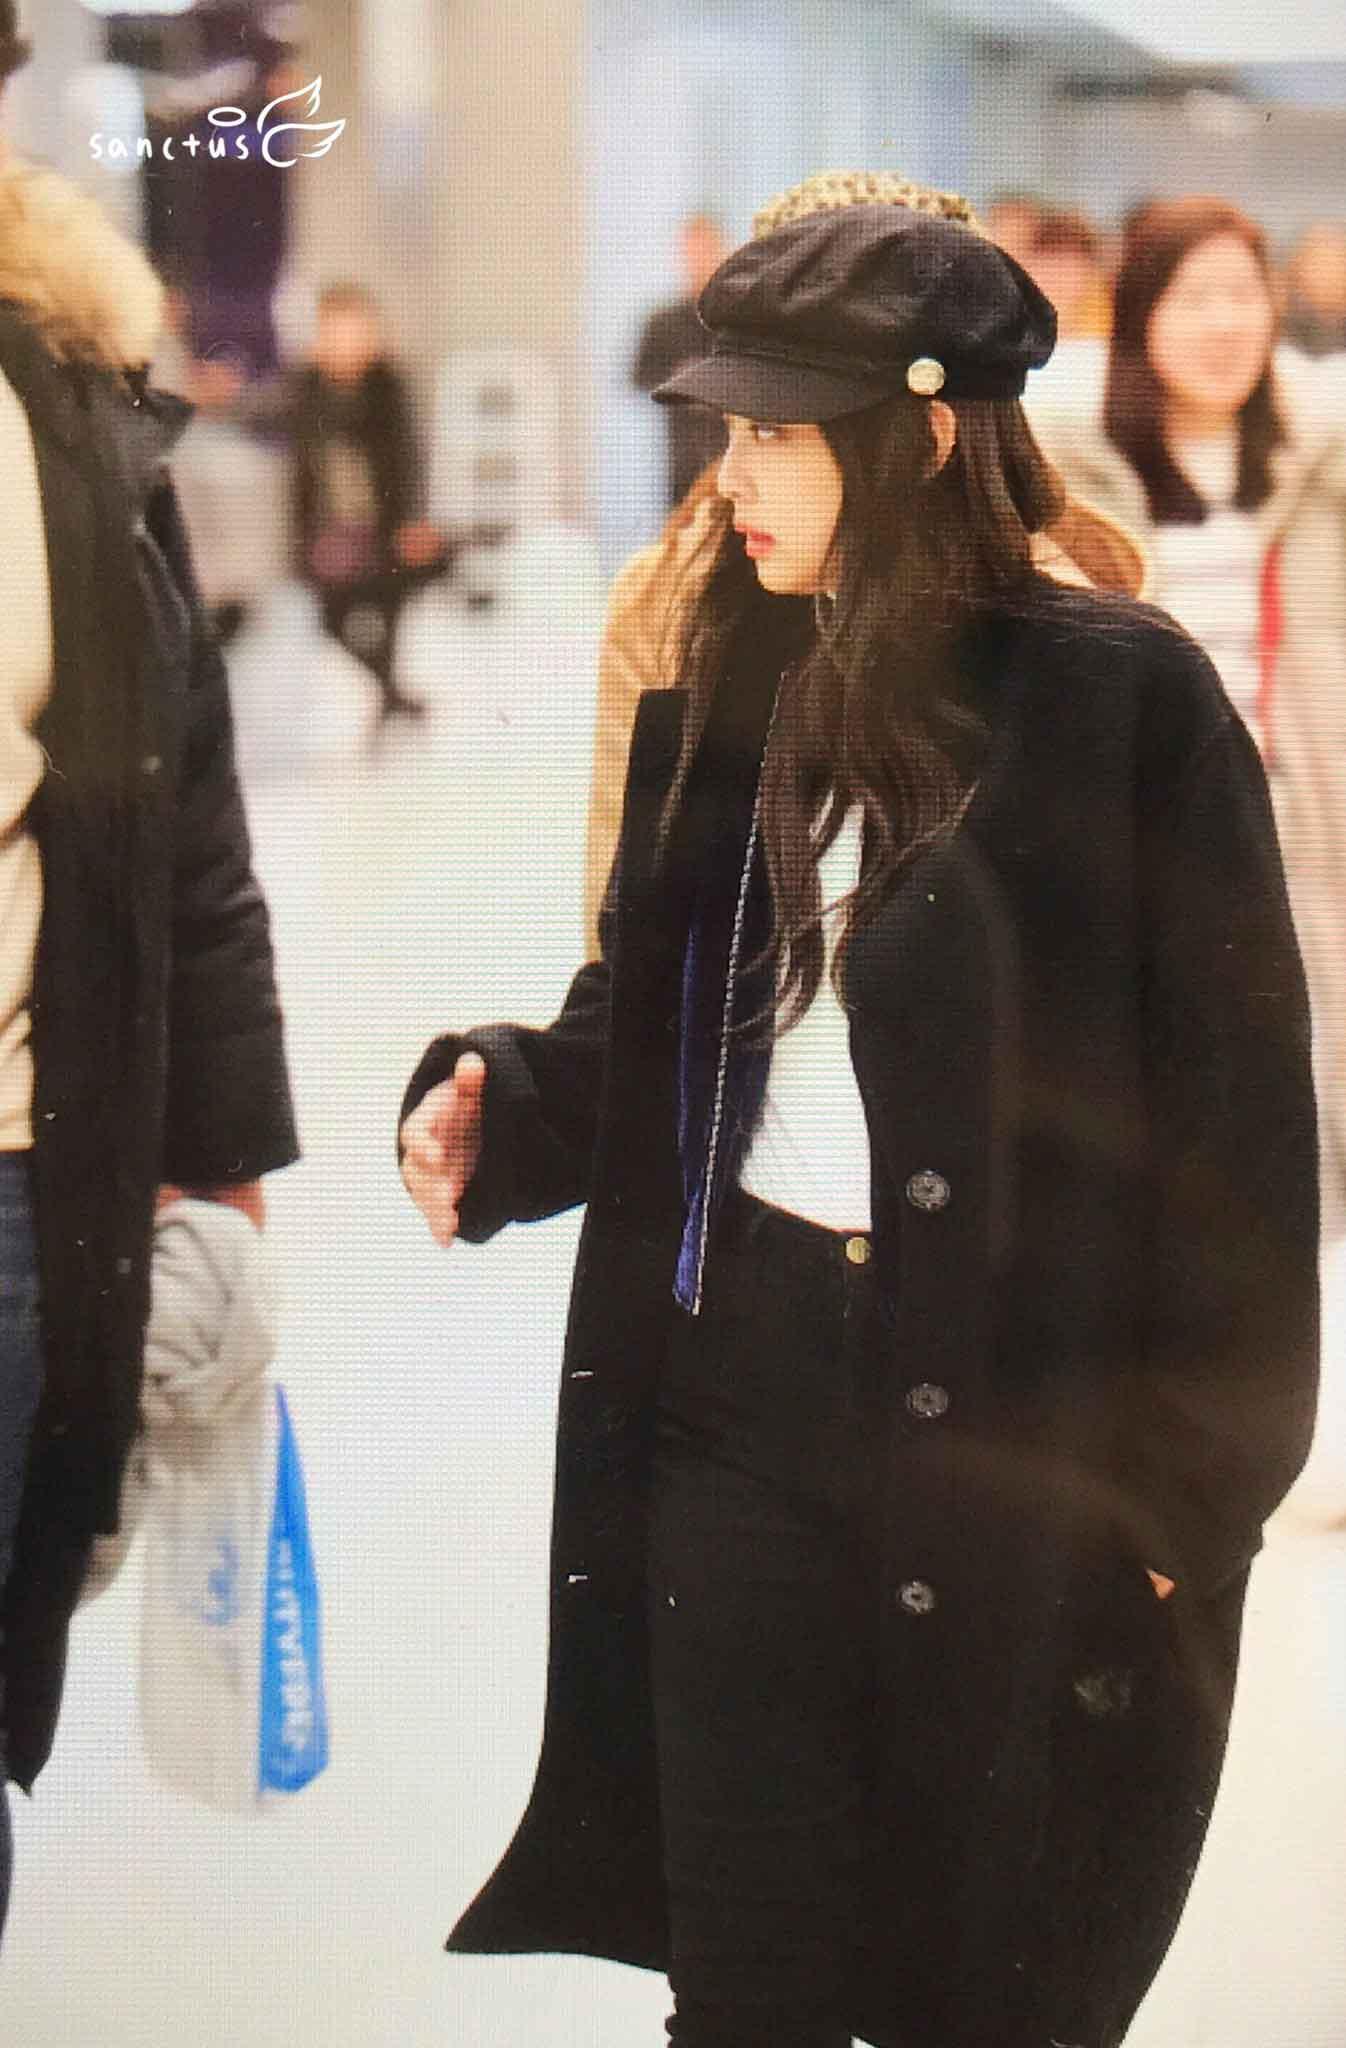 Blackpink Jennie Winter Airport Style From Jeju Island